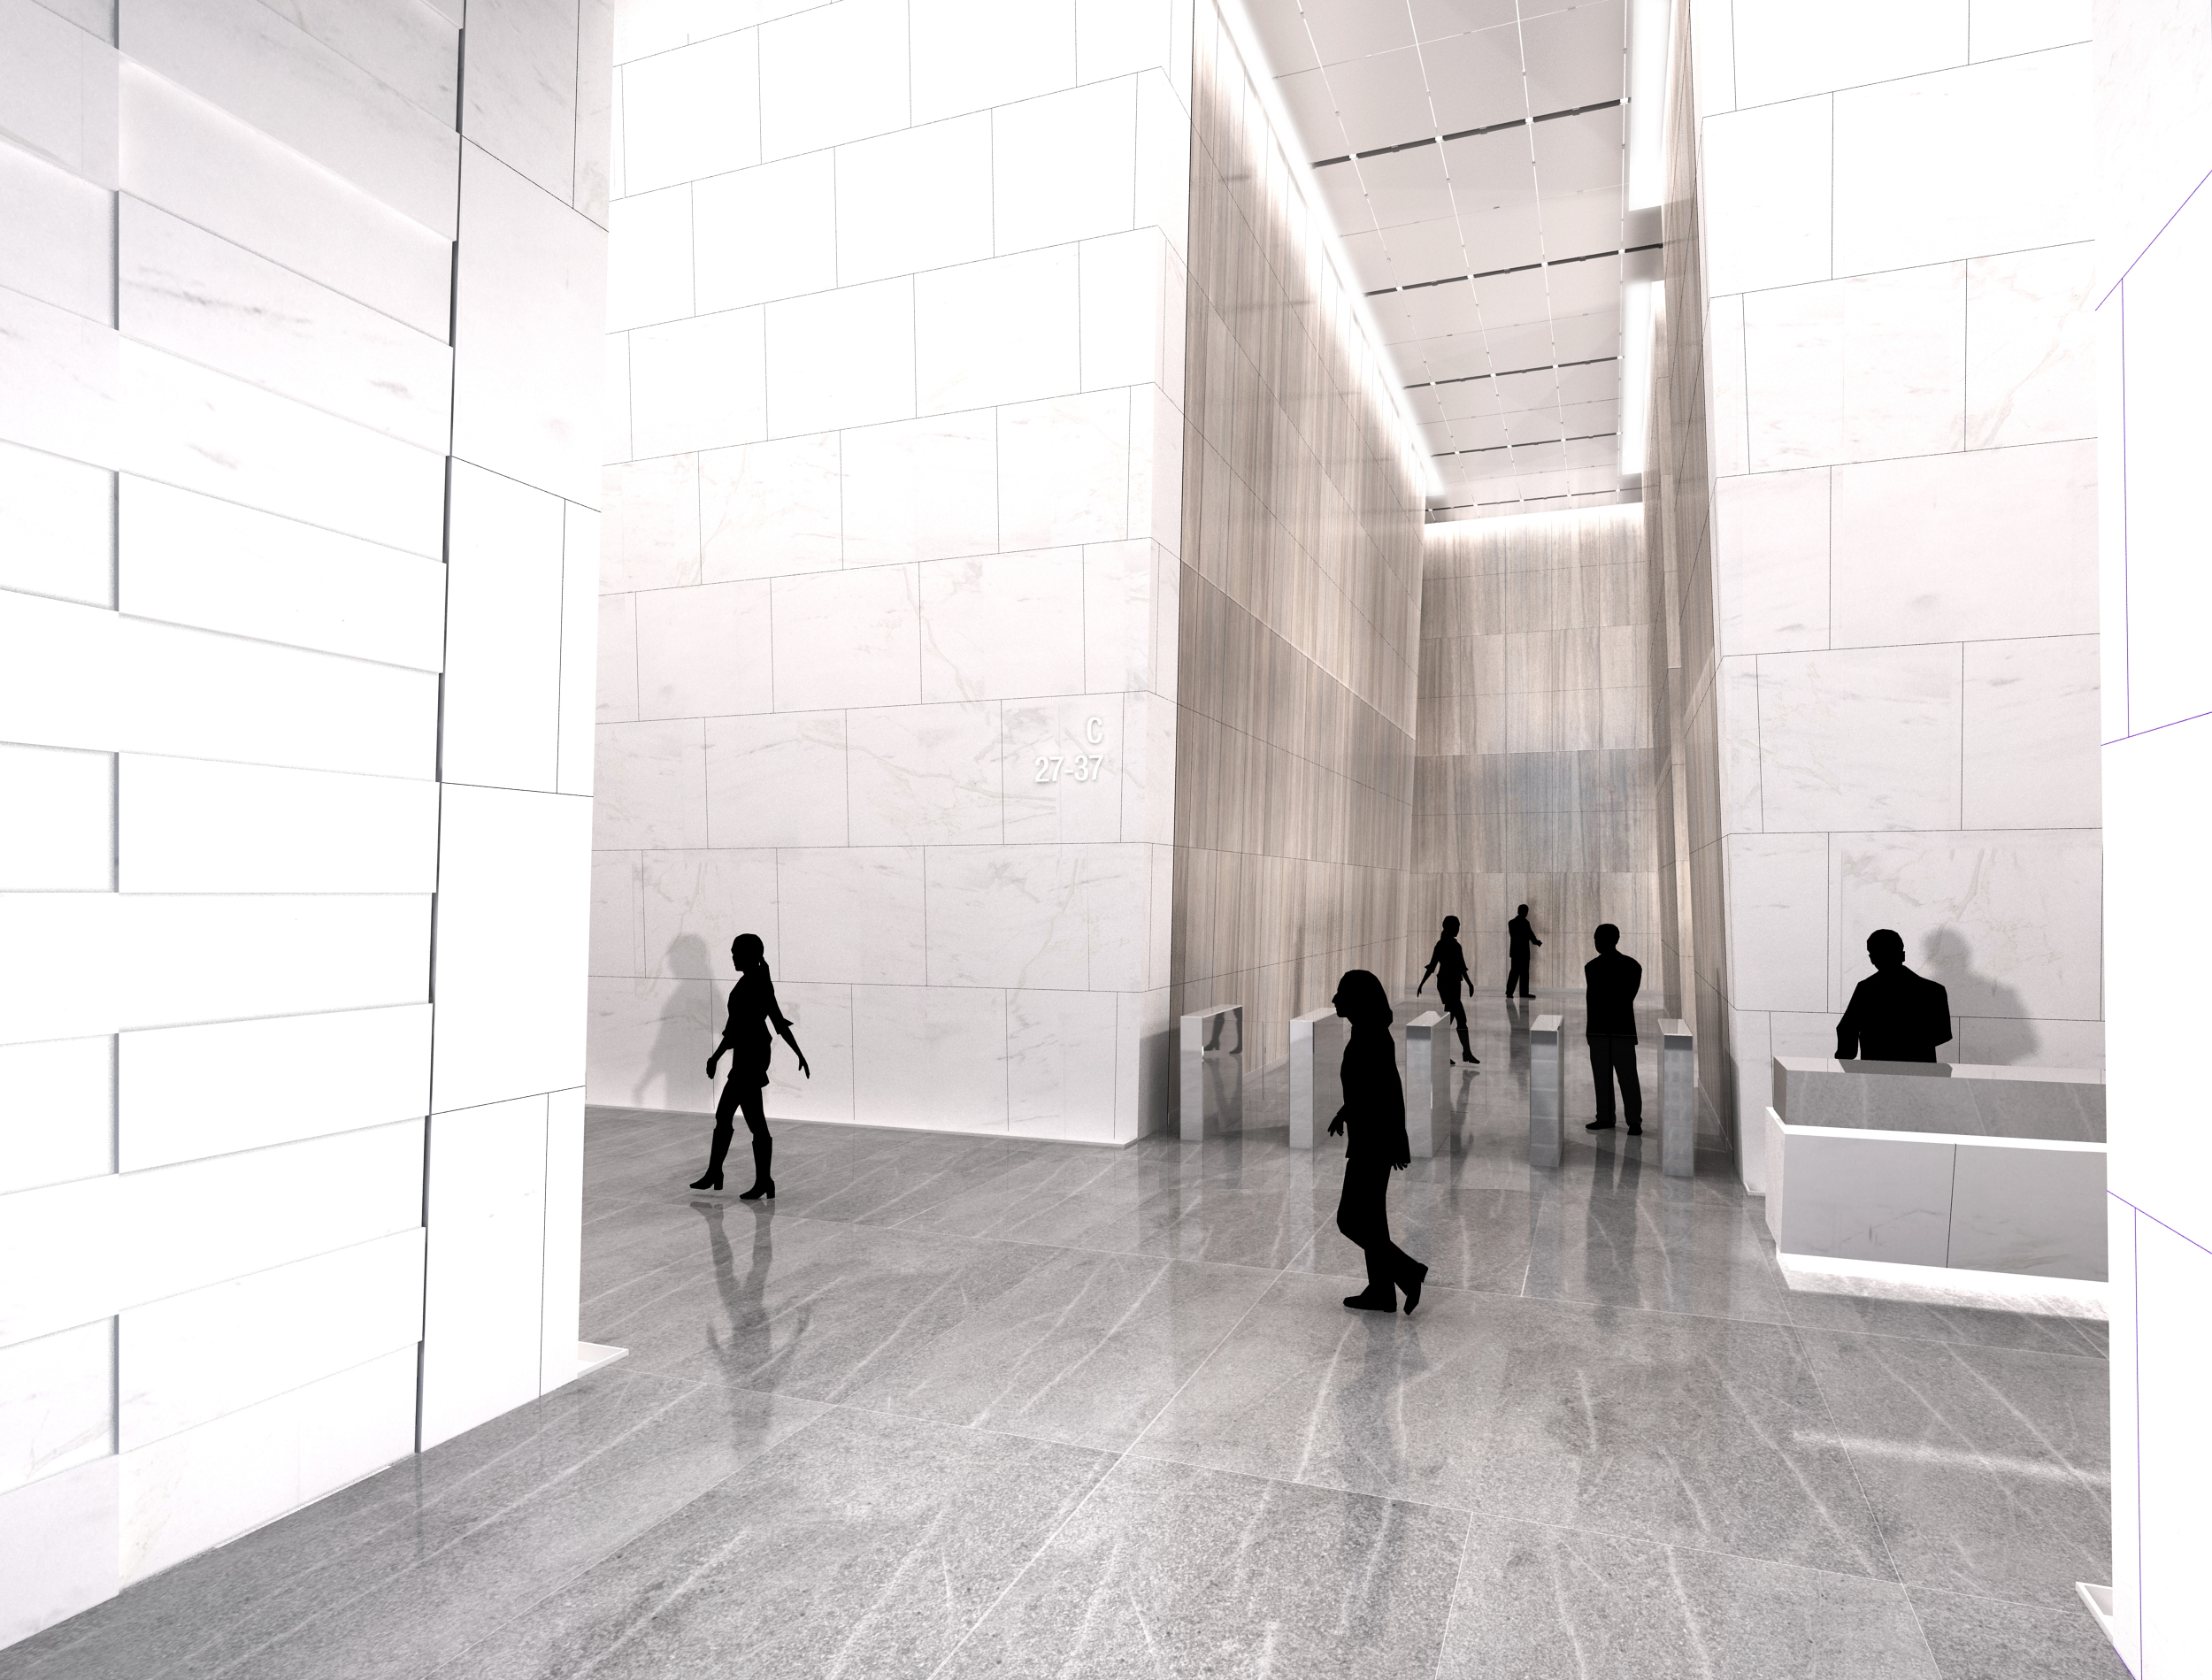 office lobby south entry.jpg